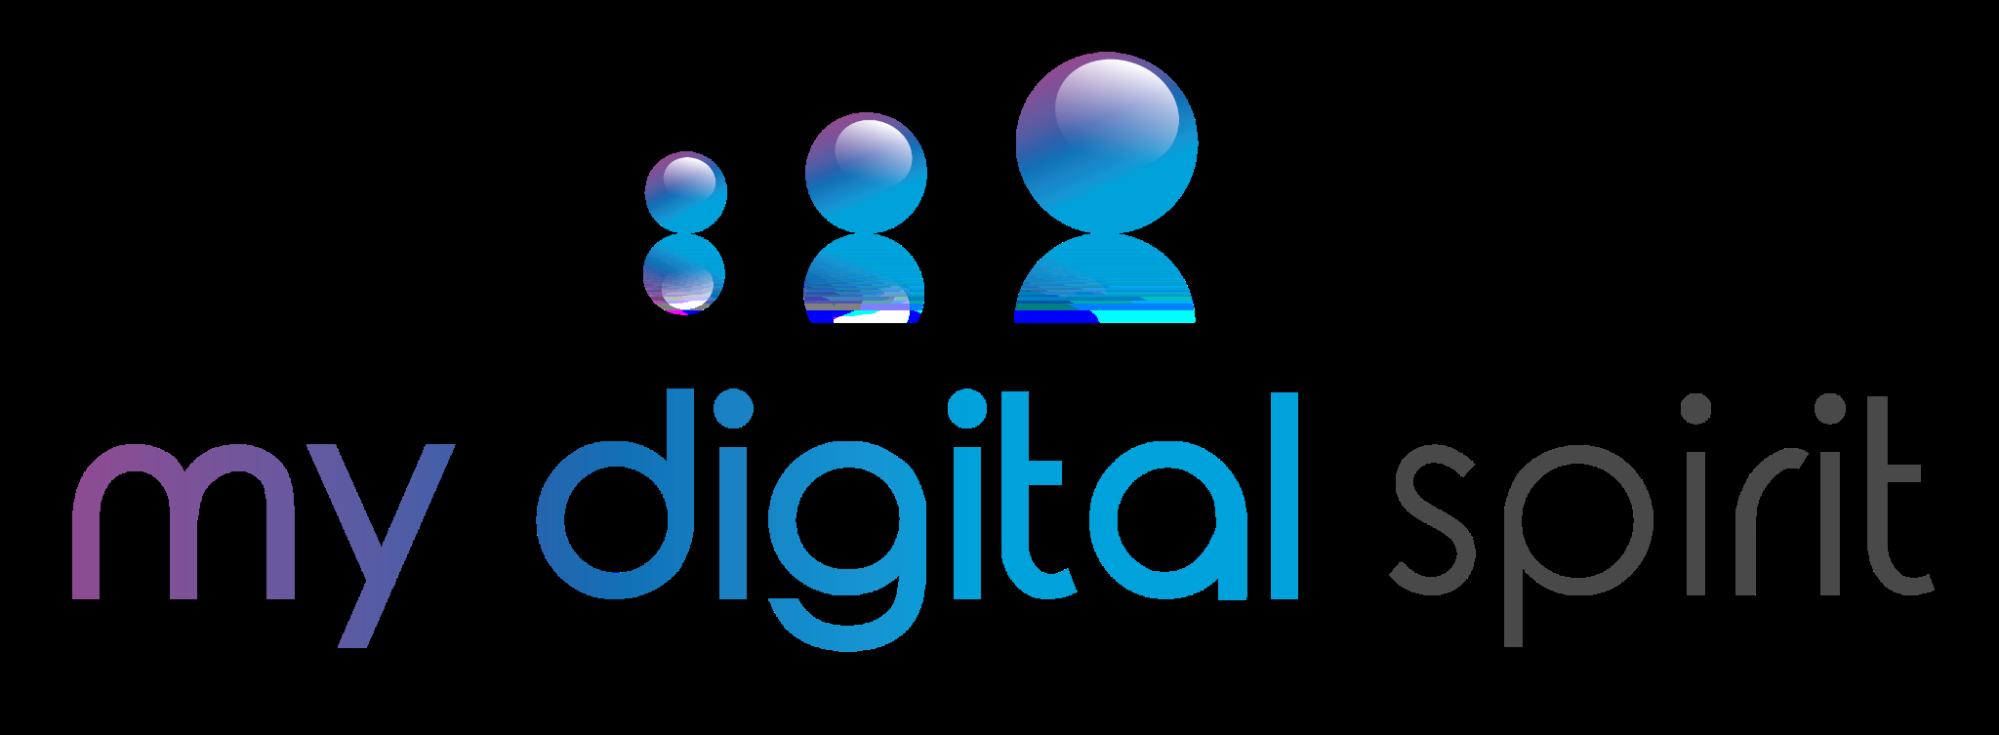 My Digital Spirit